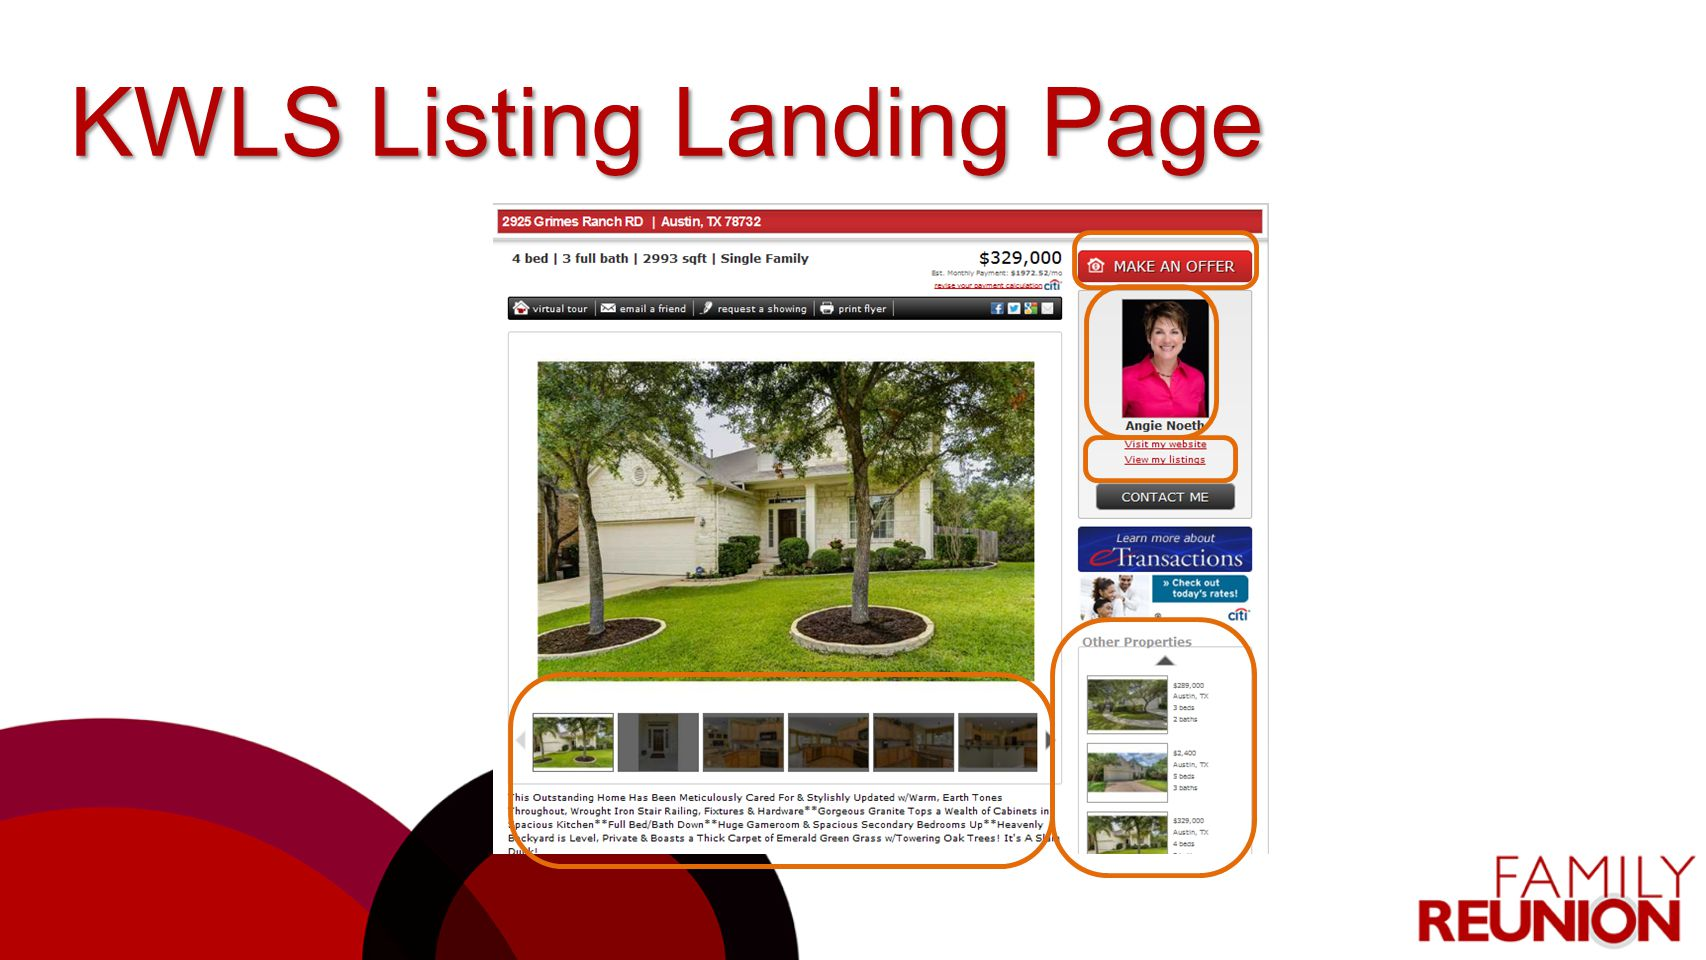 KWLS Listing Landing Page